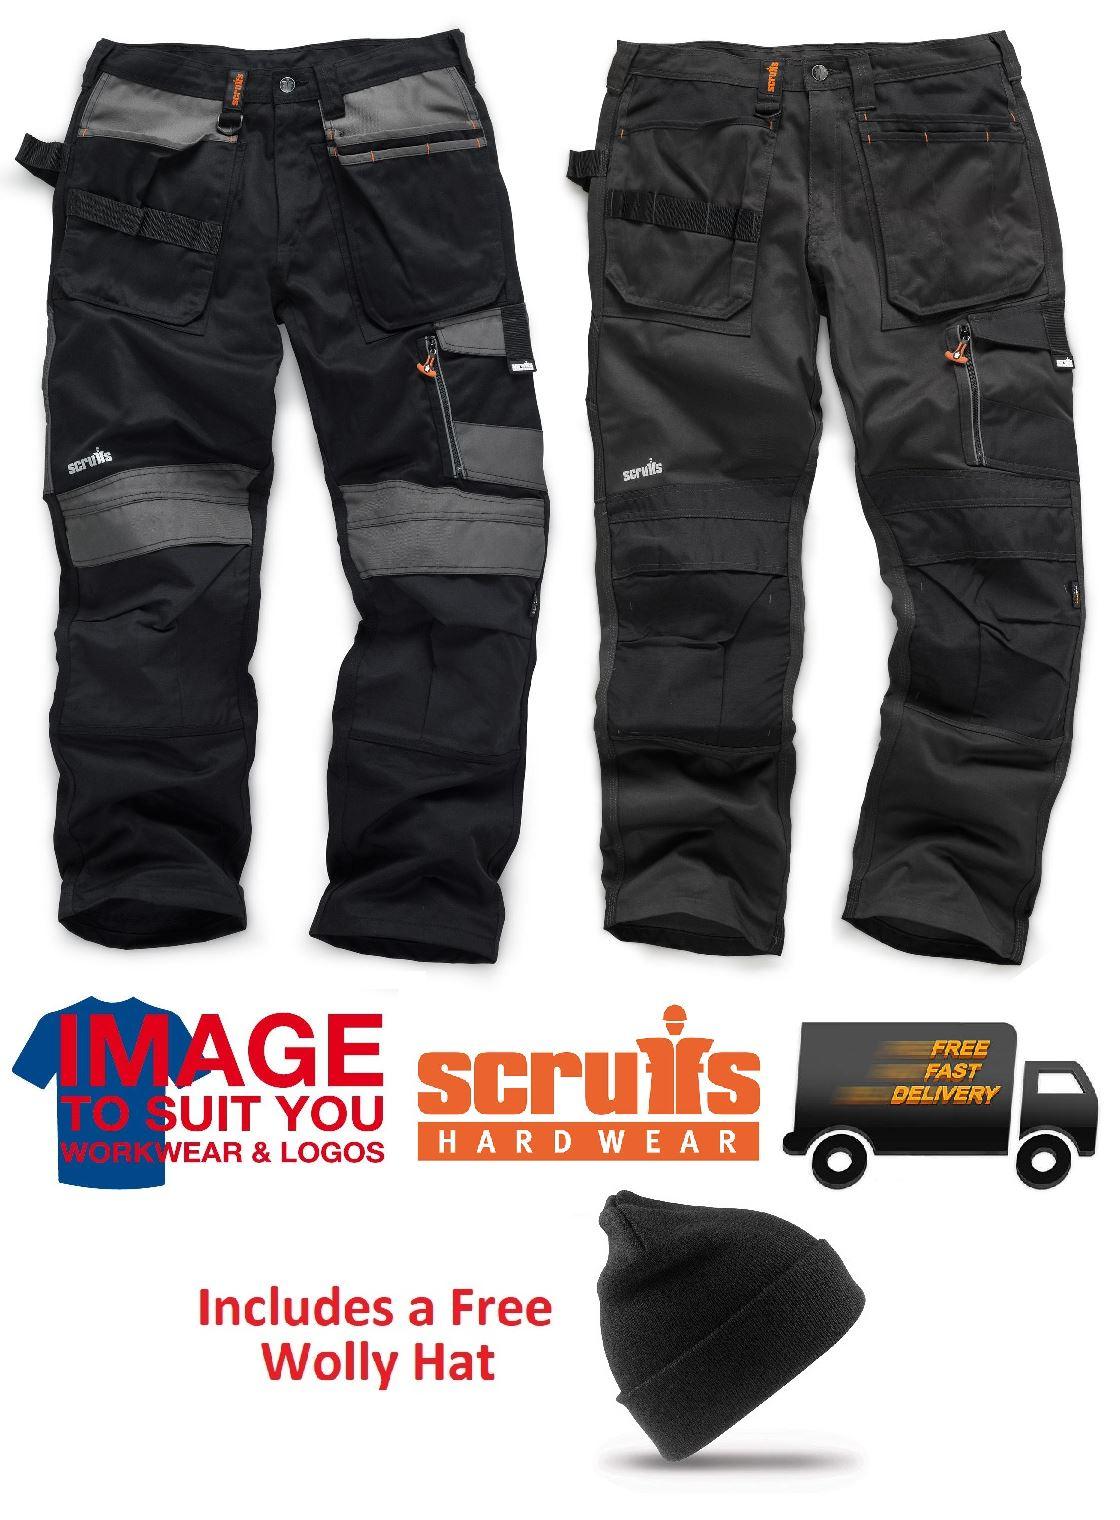 SCRUFFS Work Trousers 3D TRADE Hard-Wearing Knee Pad Pockets FREE KNEE PADS